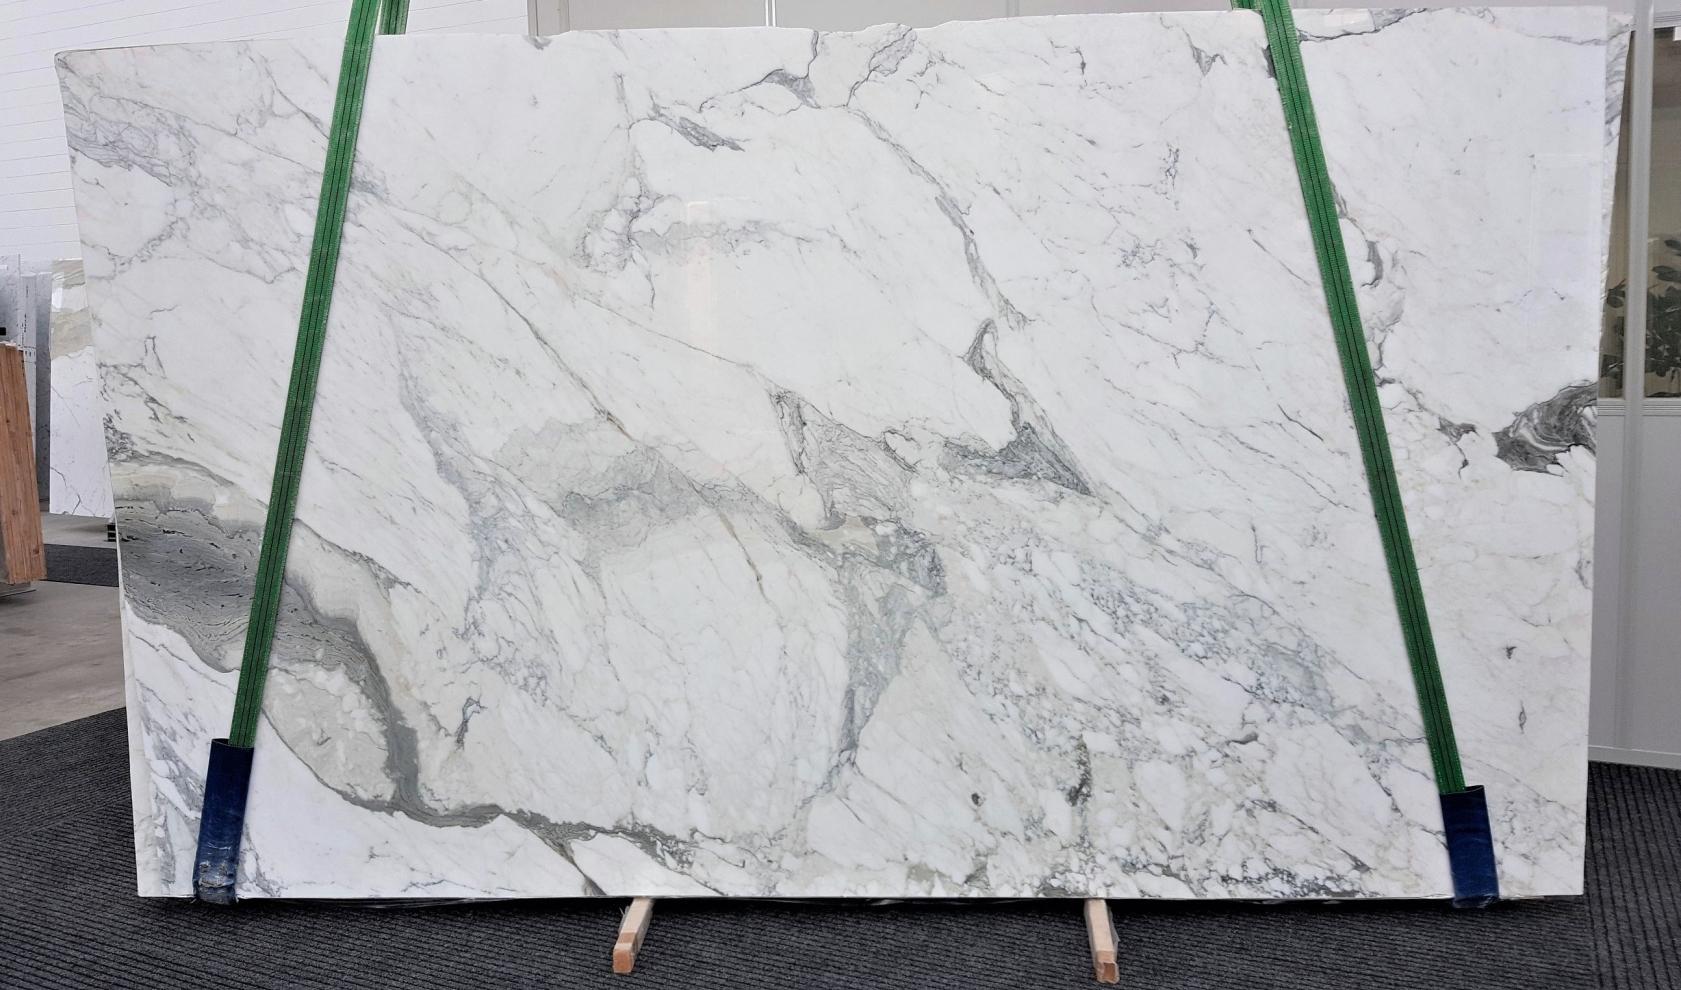 CALACATTA FANTASIA Supply Veneto (Italy) polished slabs GL 998 , Slab 1 natural marble